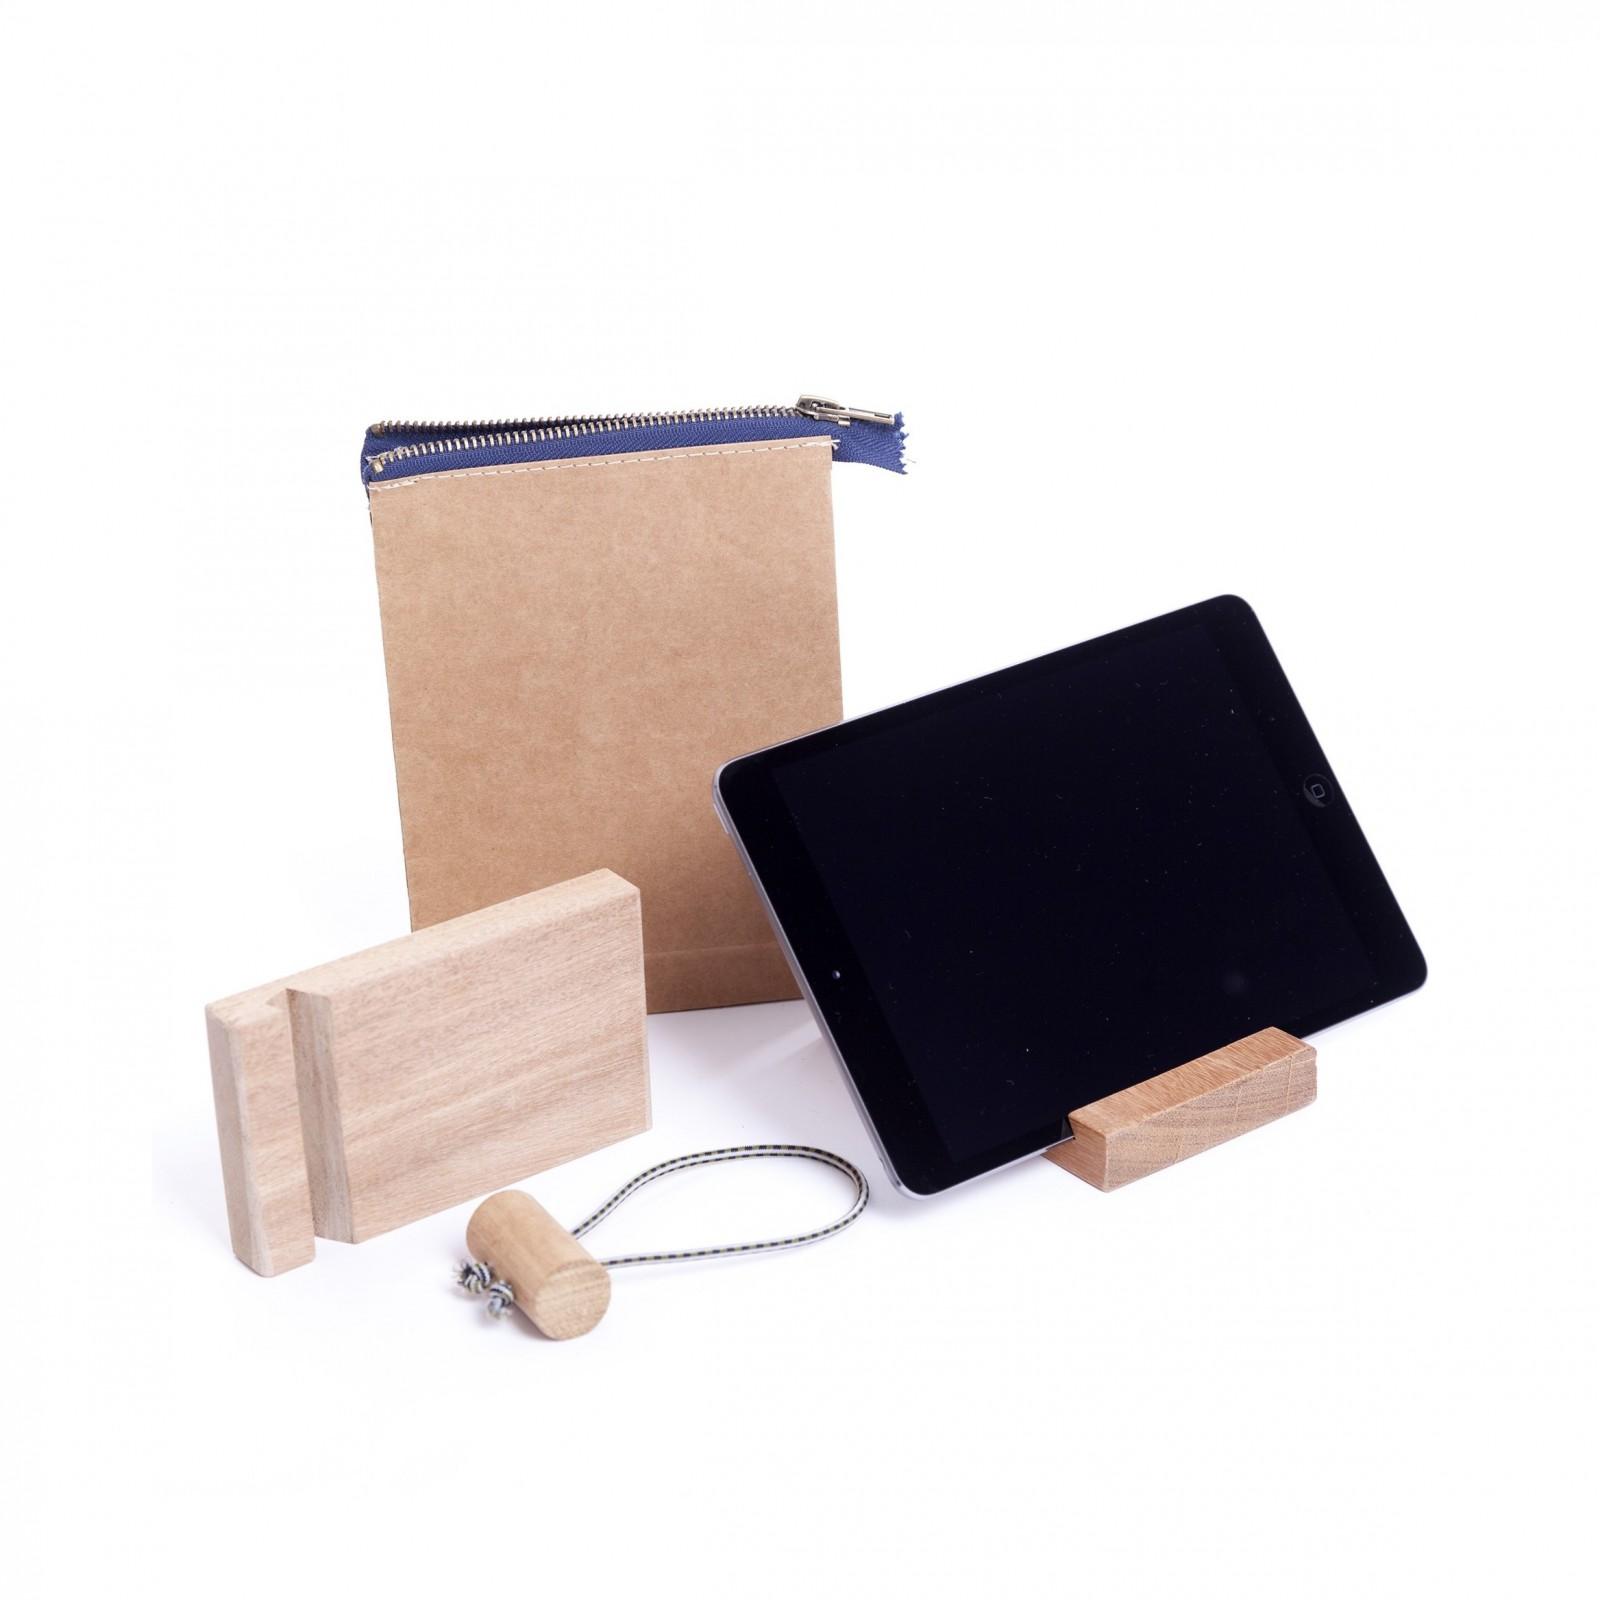 Porte tablette en bois recycl arne concept for Porte tablette